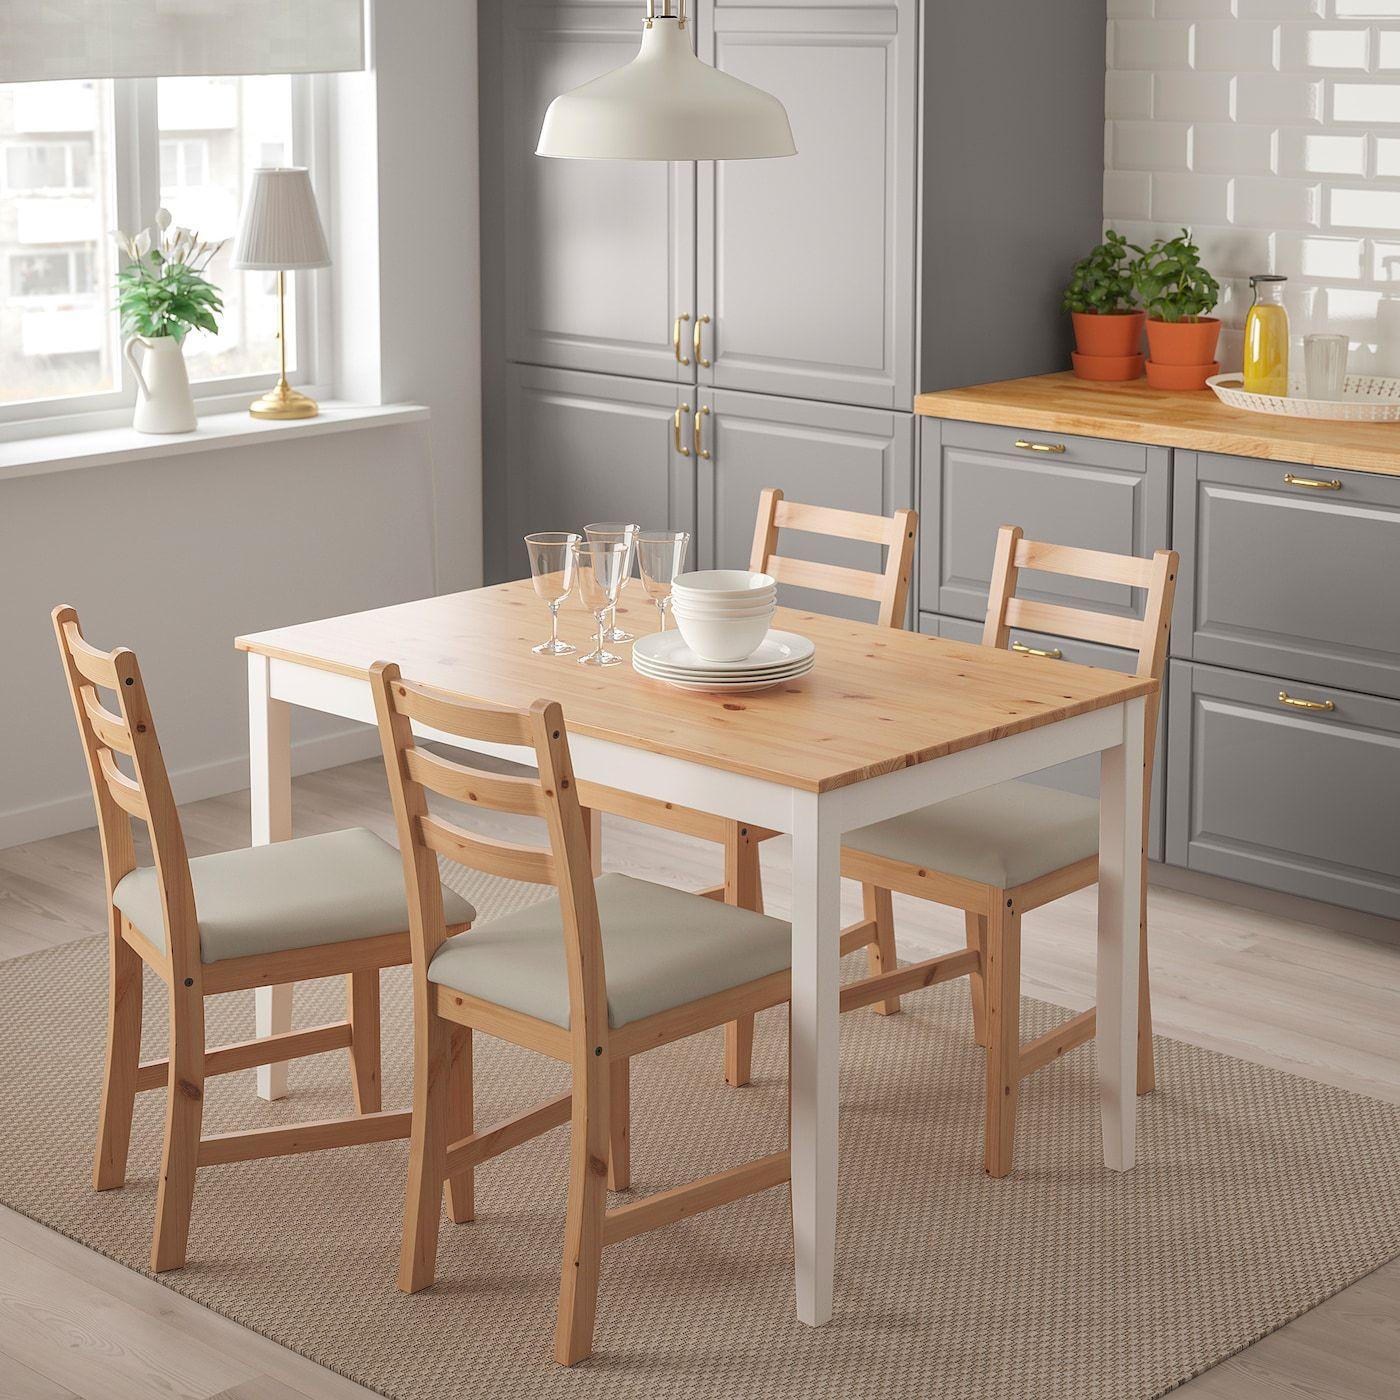 Lerhamn Mesa Tinte Envejecido Claro Tinte Blanco 118 X74 Cm Ikea In 2020 Small Dining Antique Stain Jokkmokk